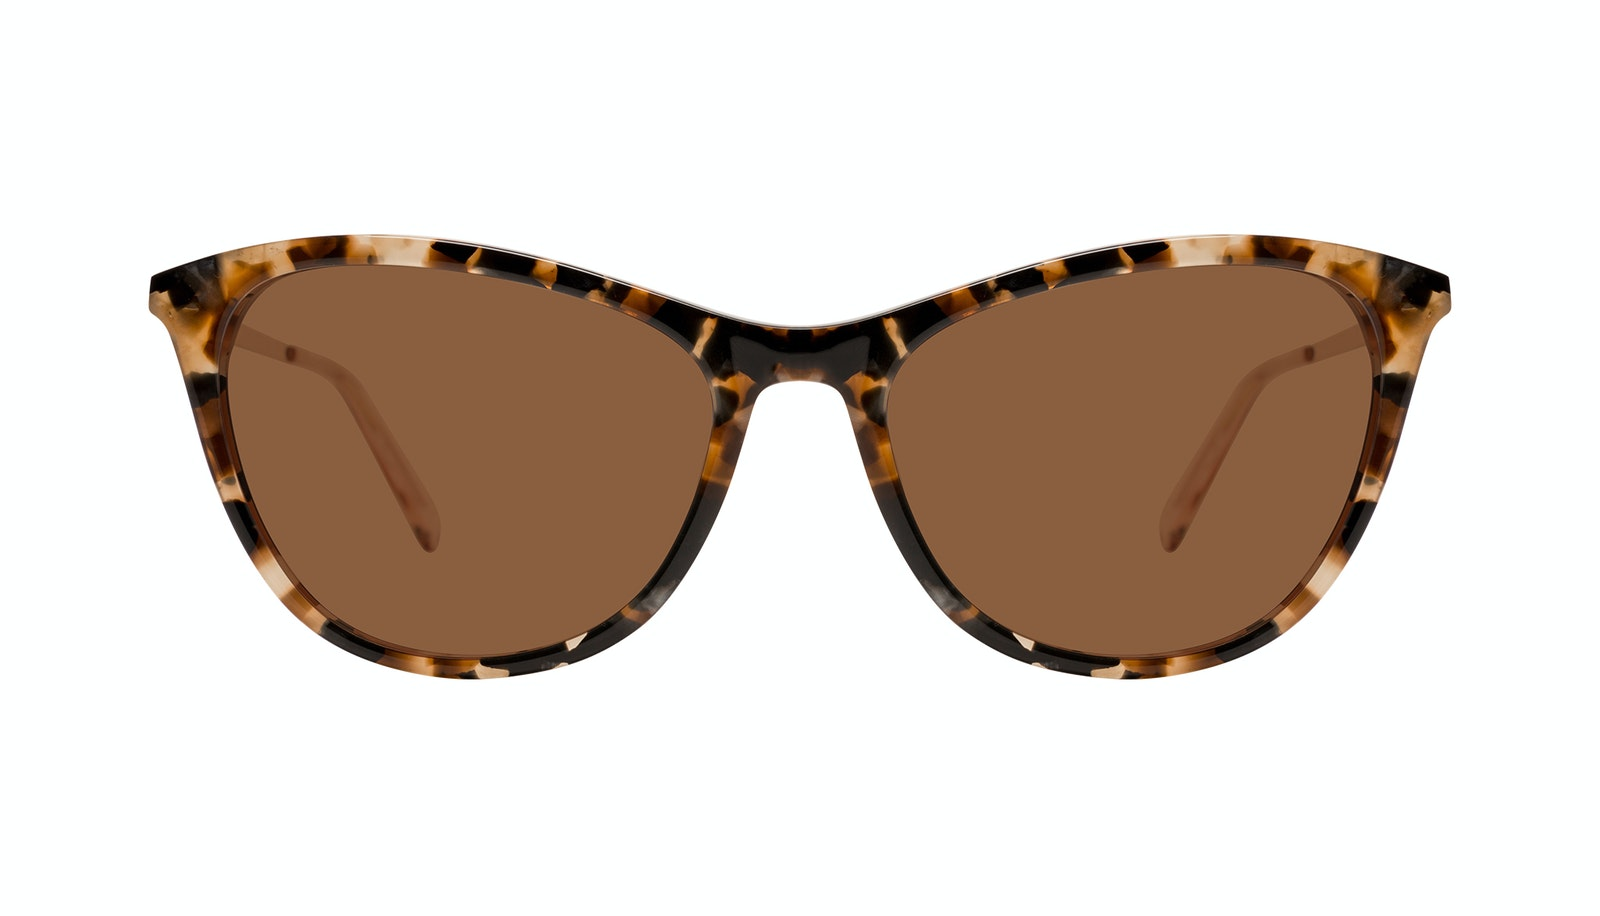 Affordable Fashion Glasses Rectangle Sunglasses Women Folk Plus Gold Flake